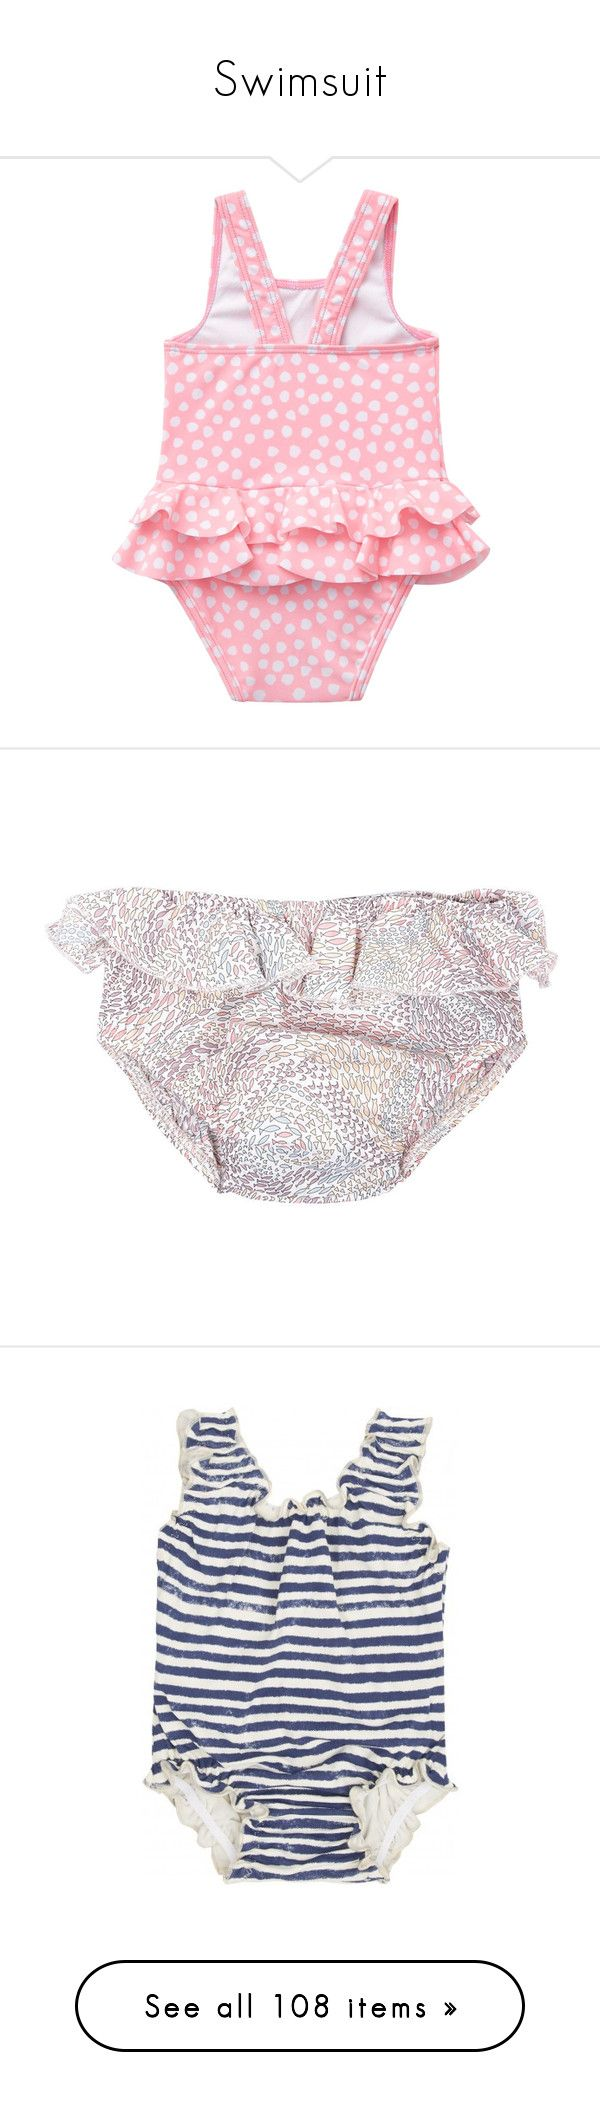 """Swimsuit"" by littlekidsfashion ❤ liked on Polyvore featuring swimwear, polka dot swimwear, bathing suit swimwear, upf swimwear, polka dot swim trunks, swim costume, baby girl, girls, swim and navy"